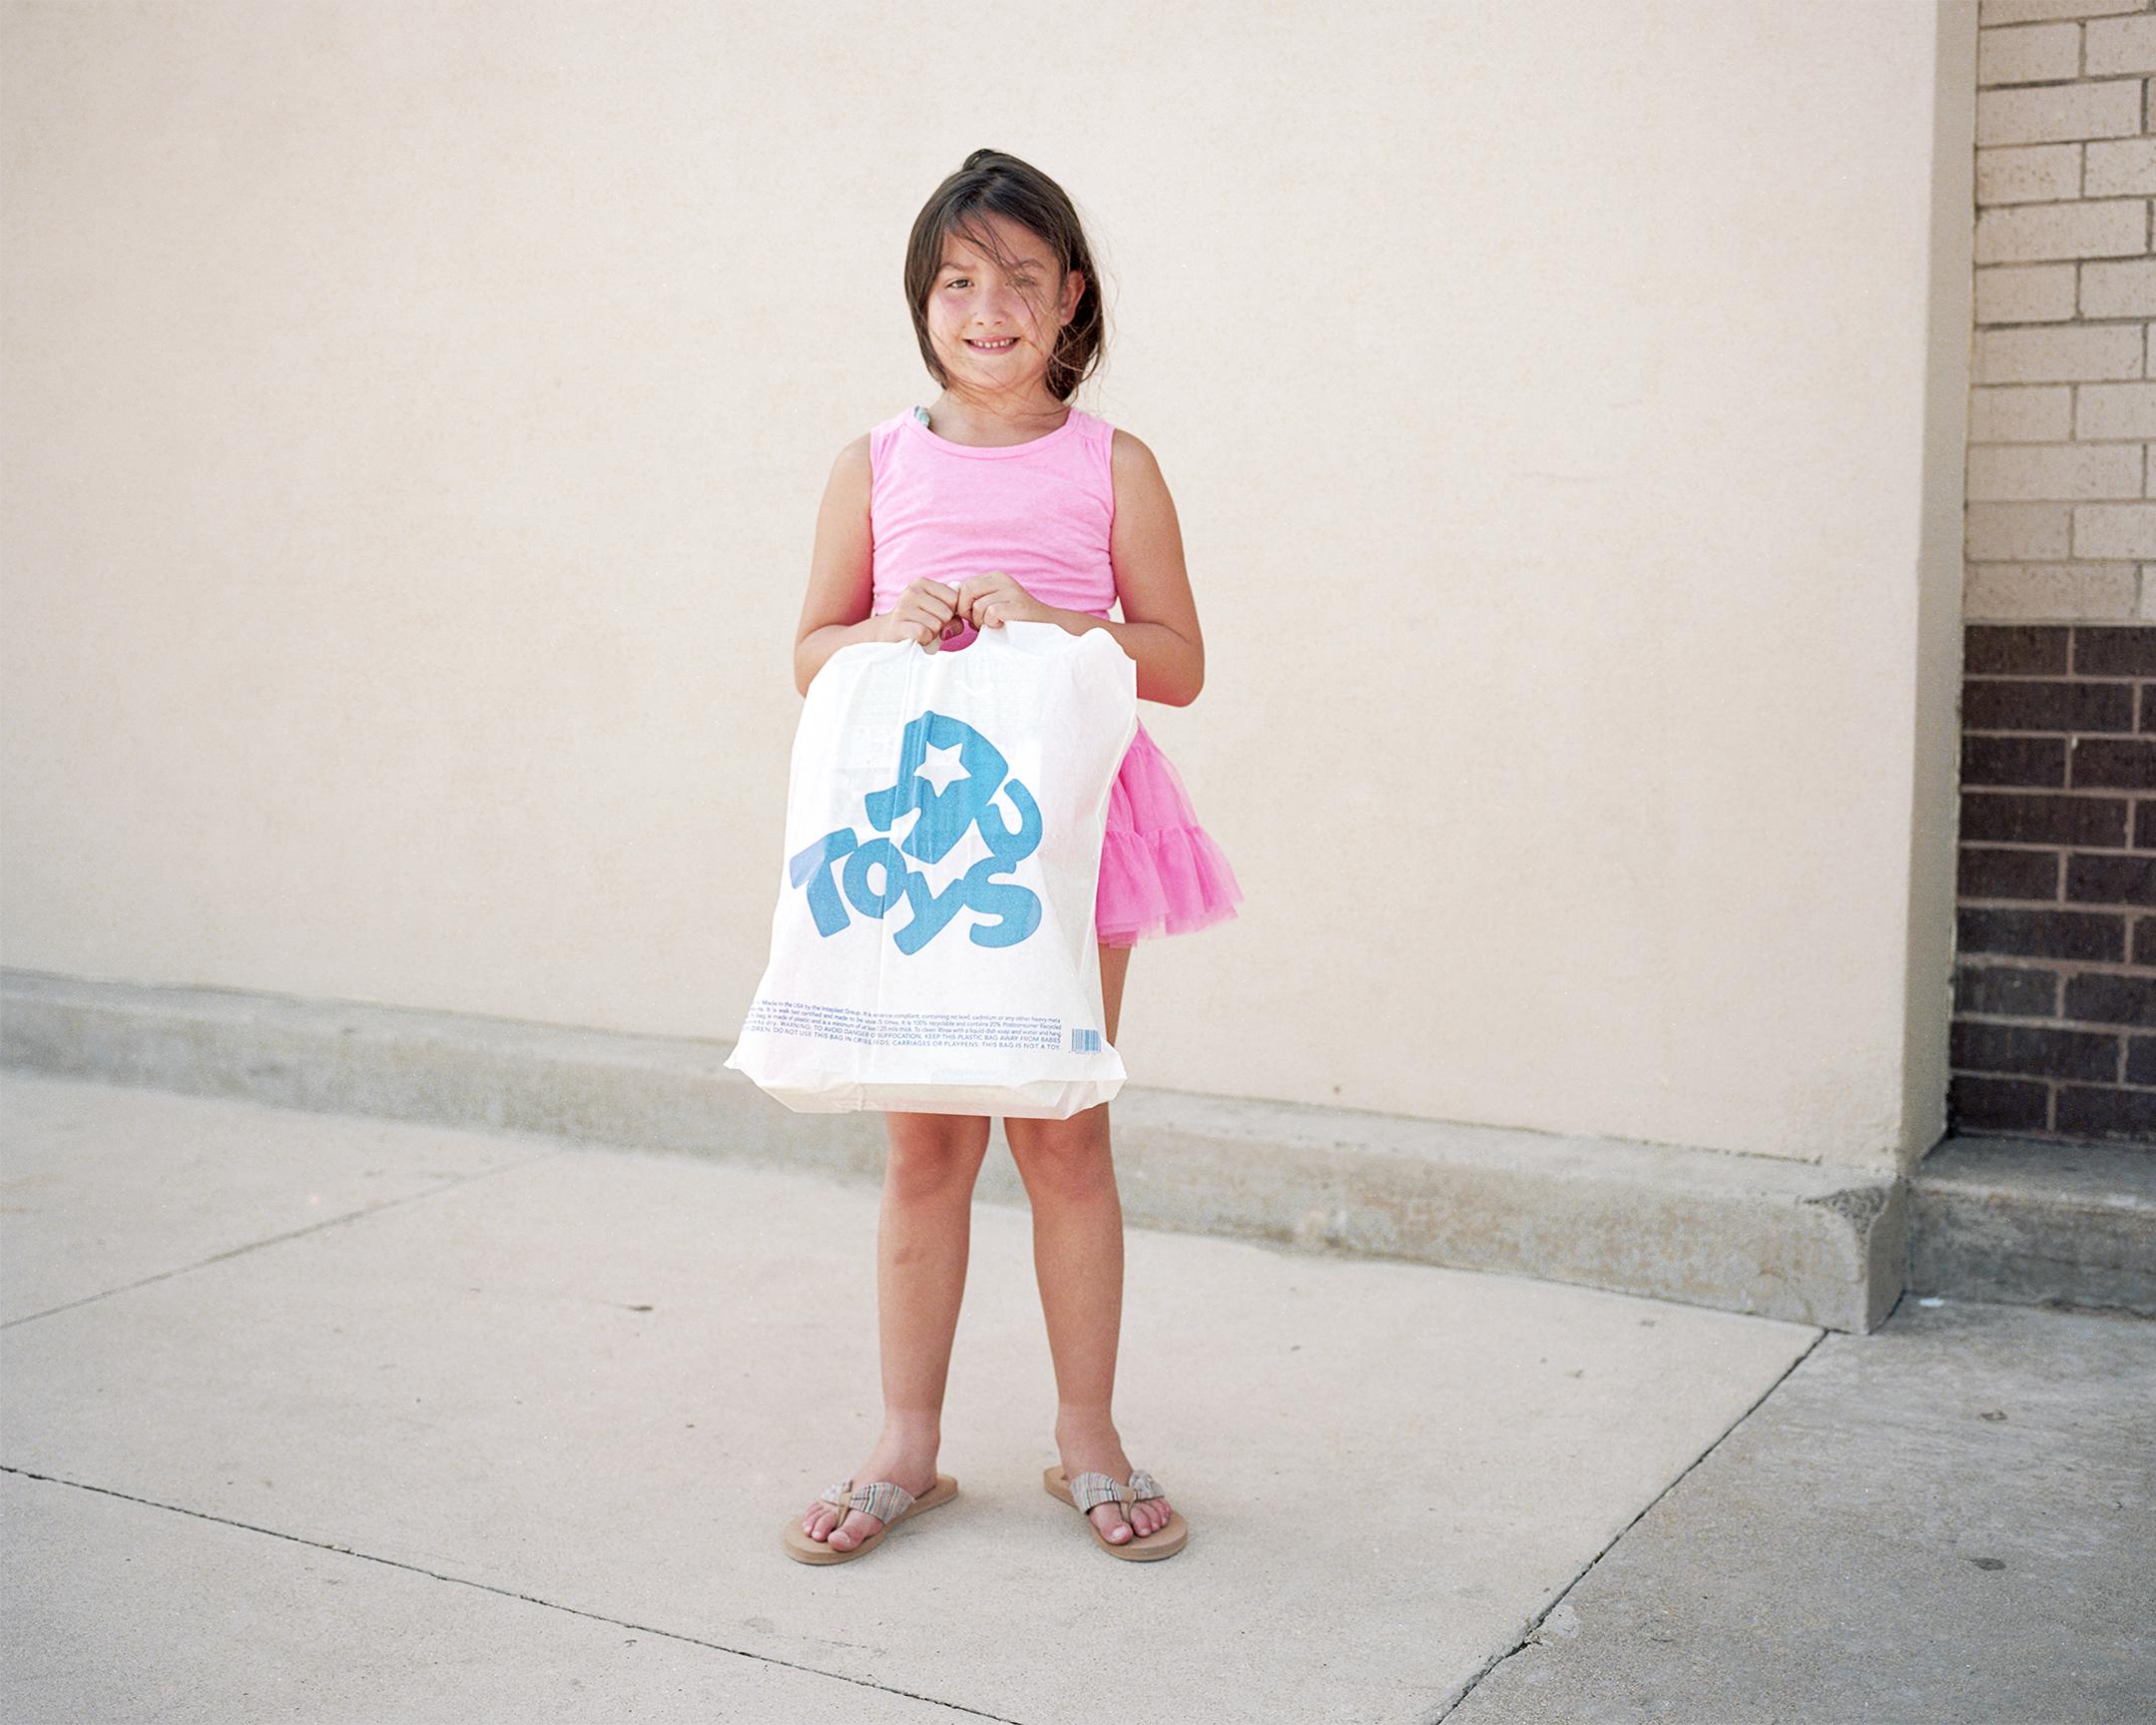 74_Toys_GirlWithShoppingBag.jpg